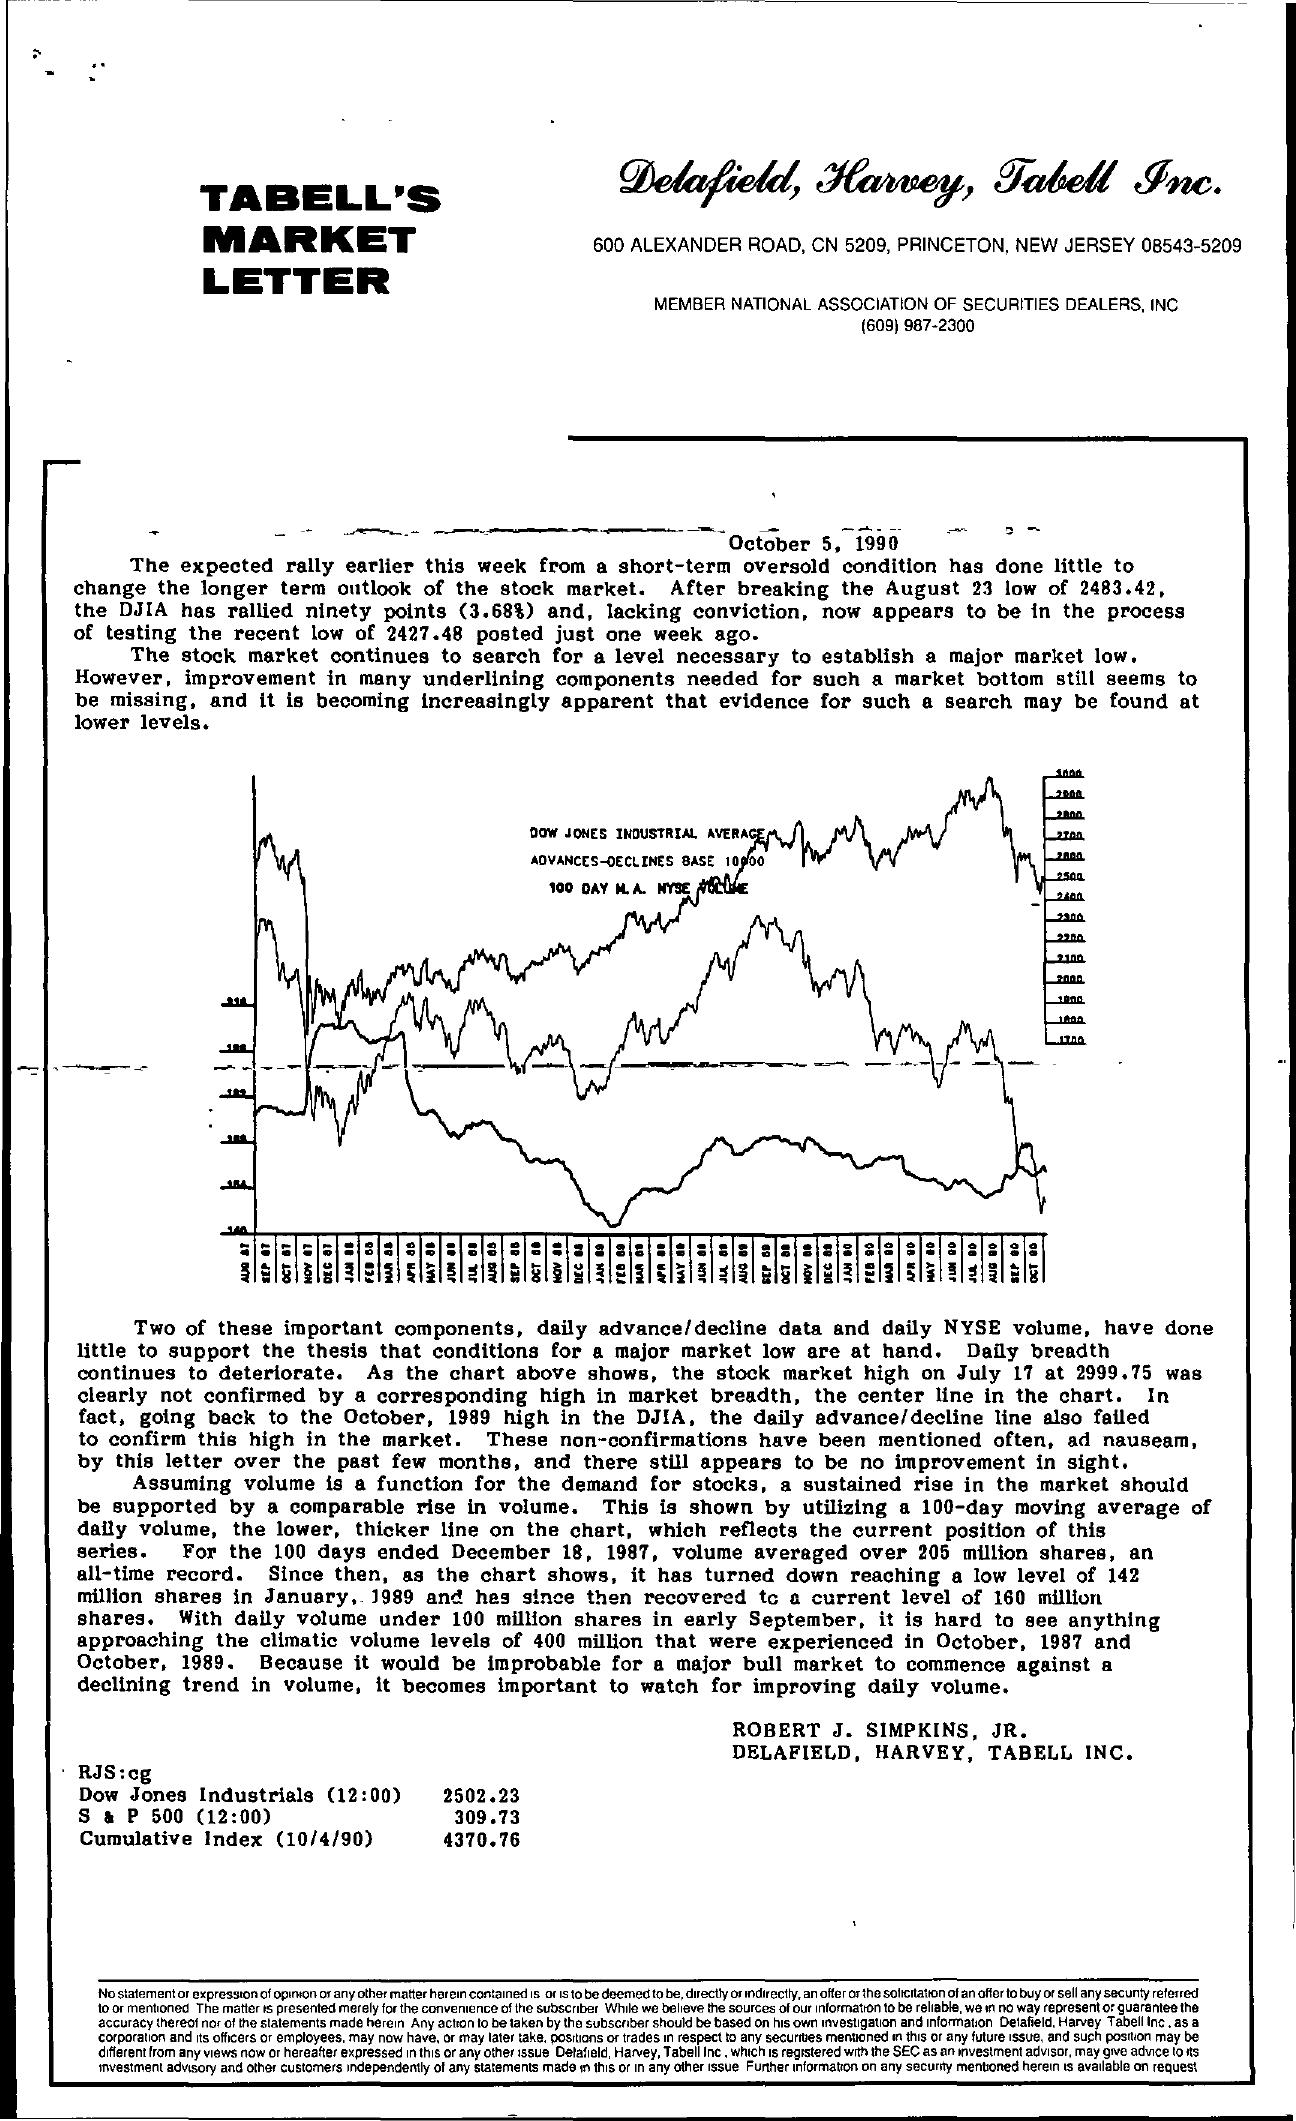 Tabell's Market Letter - October 05, 1990